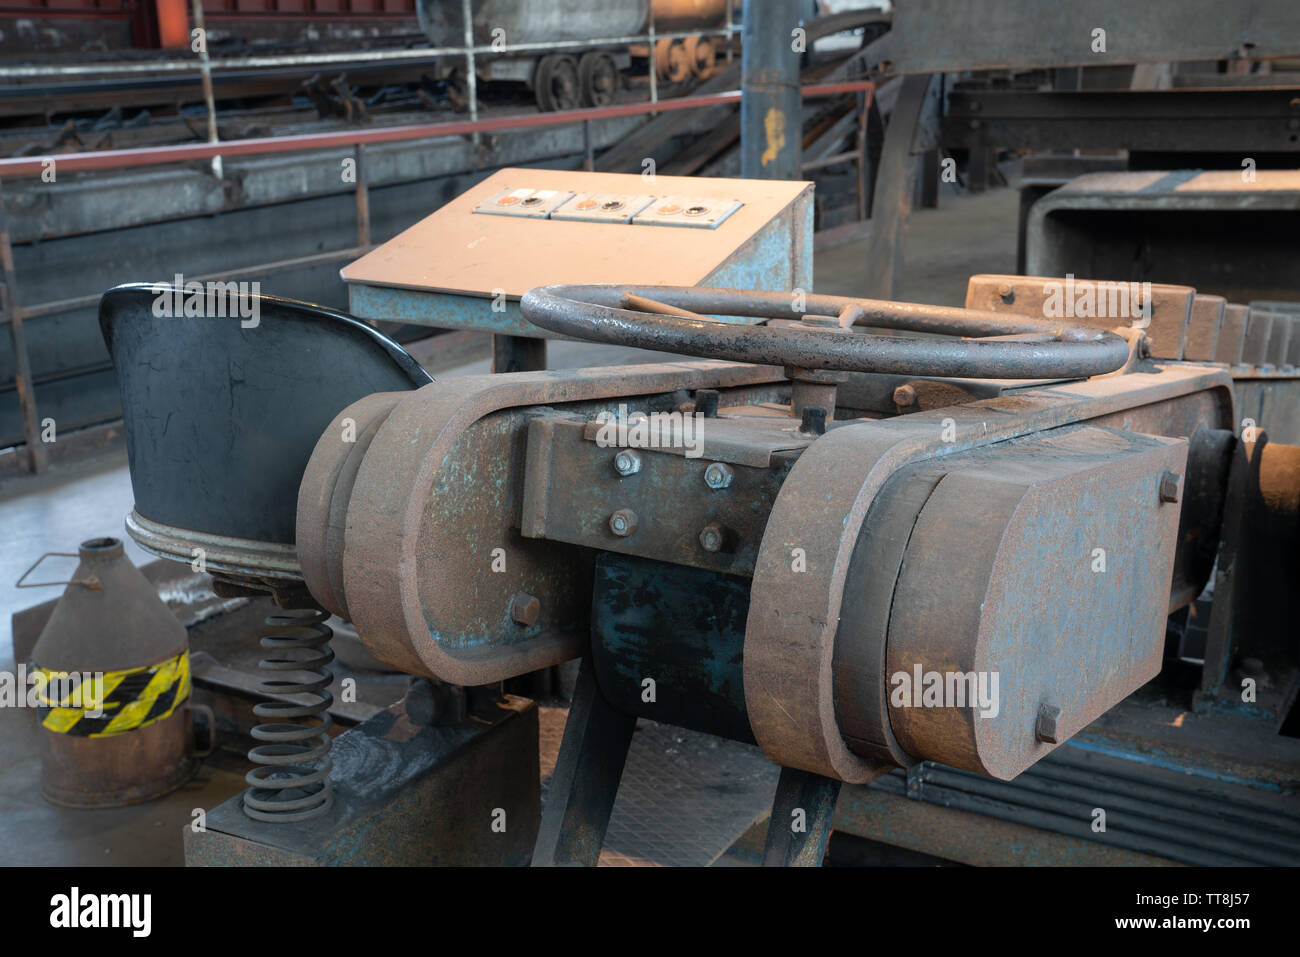 ESSEN, GERMANY - APRIL 7, 2019: Detail image of Zeche Zollverein, industrial heritage of Germany on April 7, 2019 in Essen - Stock Image